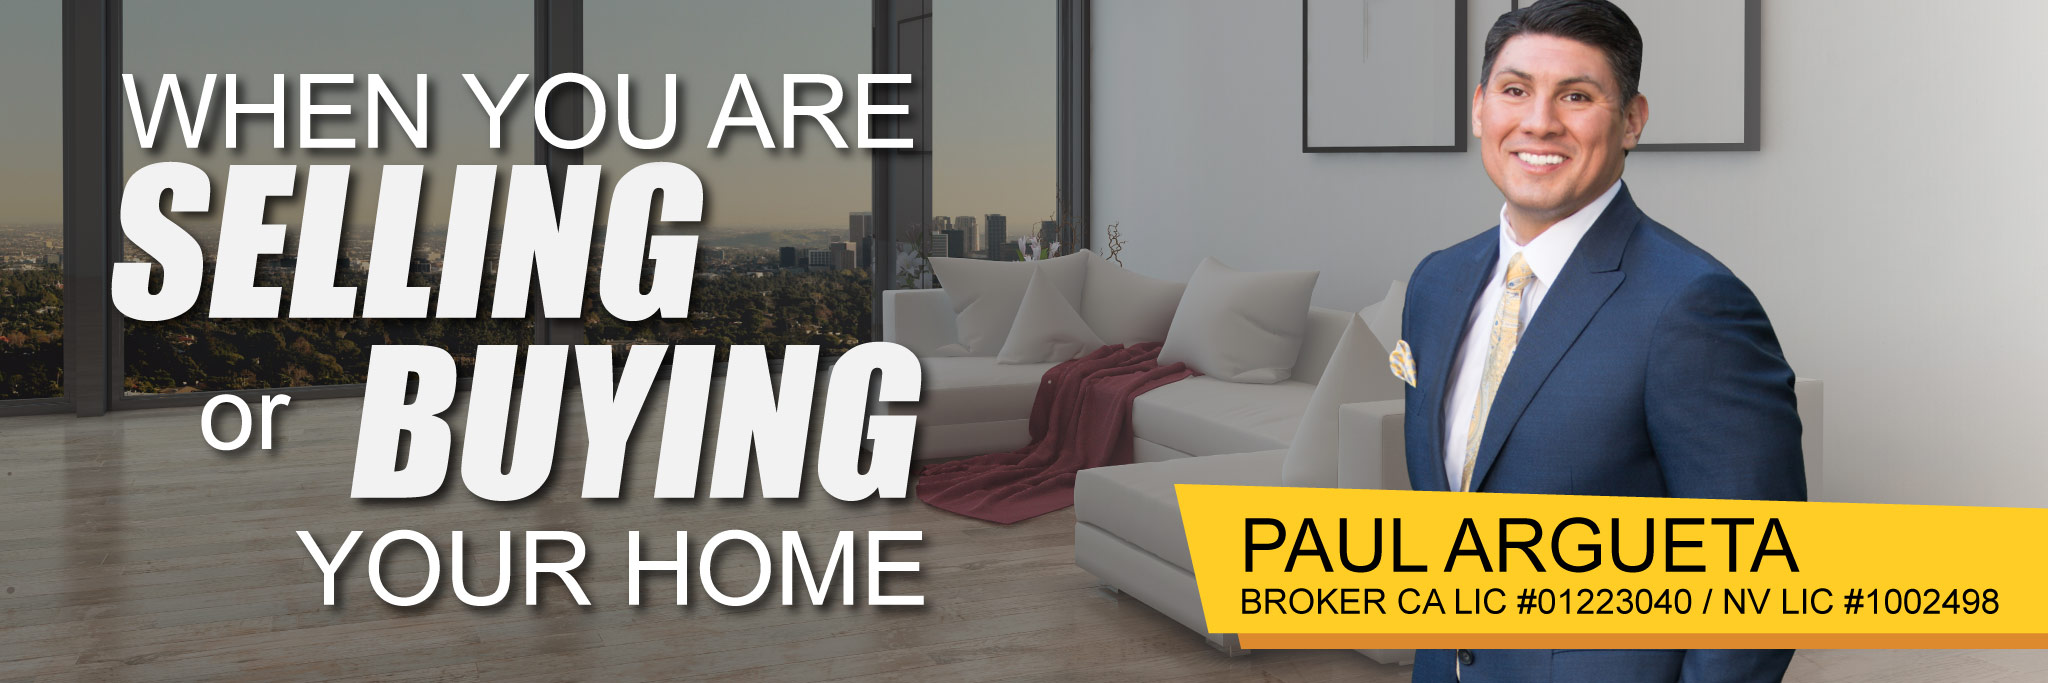 TalkToPaul-Real-Estate-Luxury-Real-Estate-Broker-Los-Angeles-Real-Estate-Las-Vegas-Real-Estate-Desktop-Banner